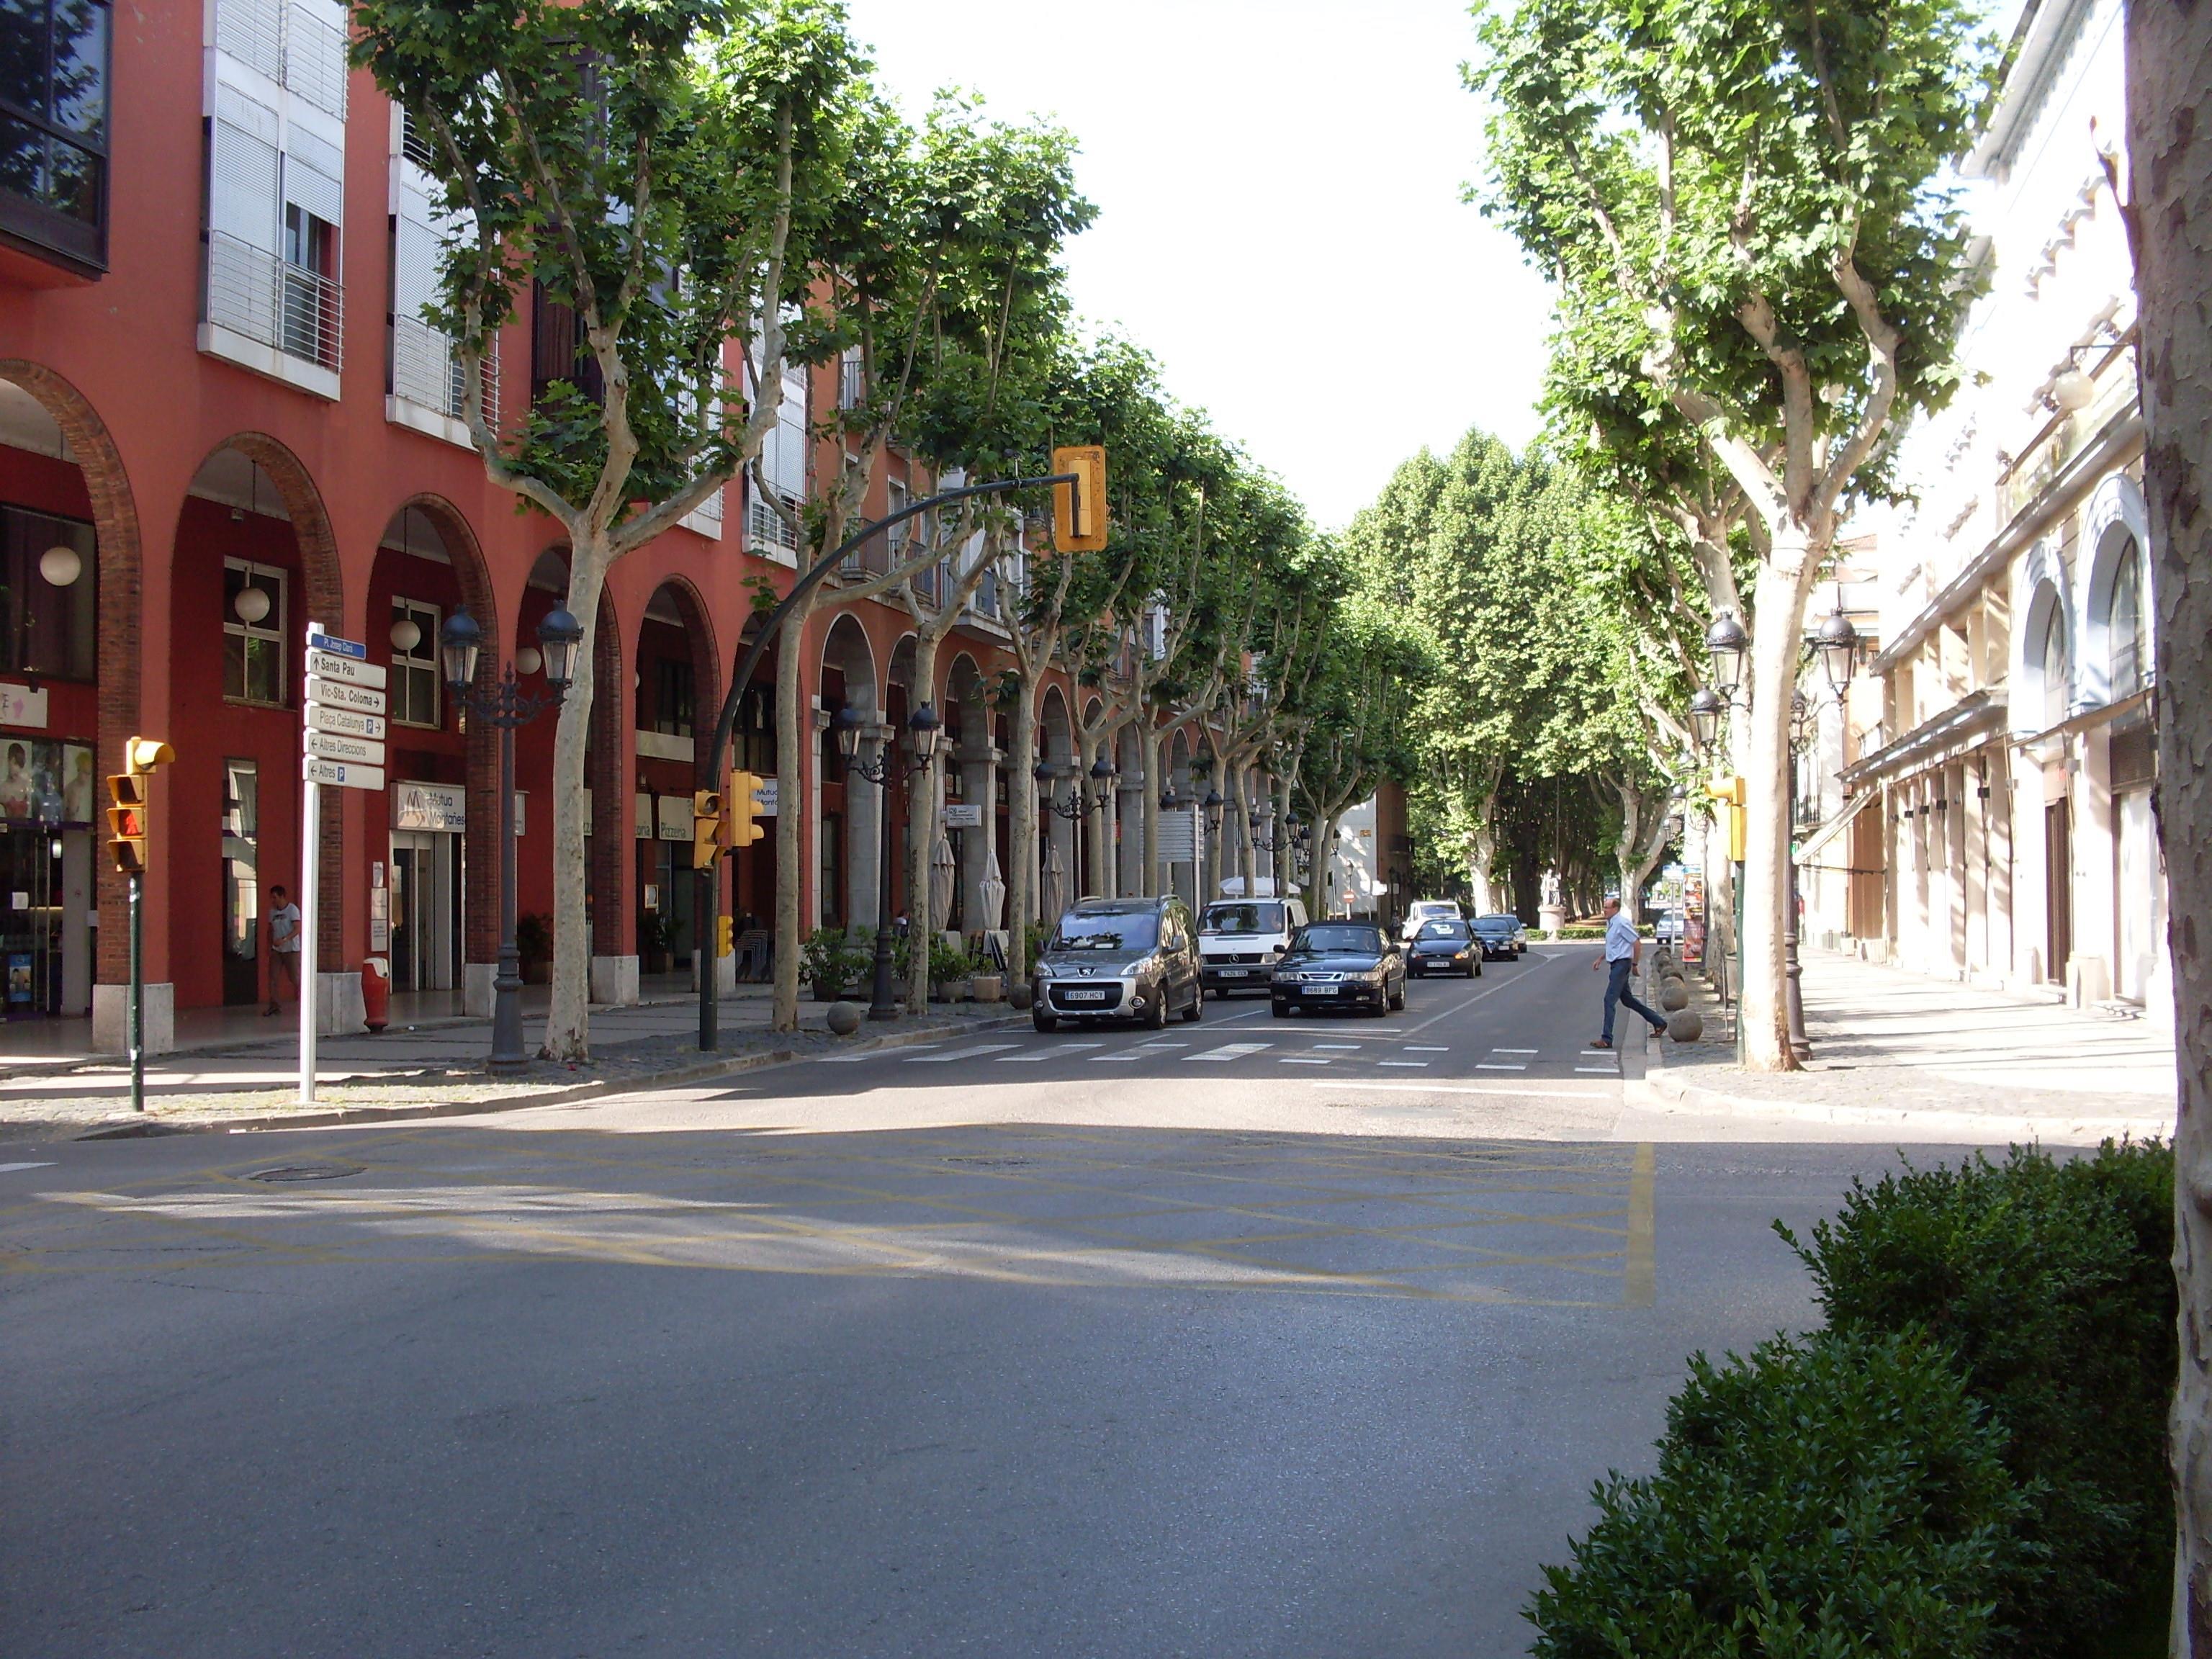 Affitto Posto auto  Paseo barcelona, 3. Parquings en venda a prop de la plaça clarà